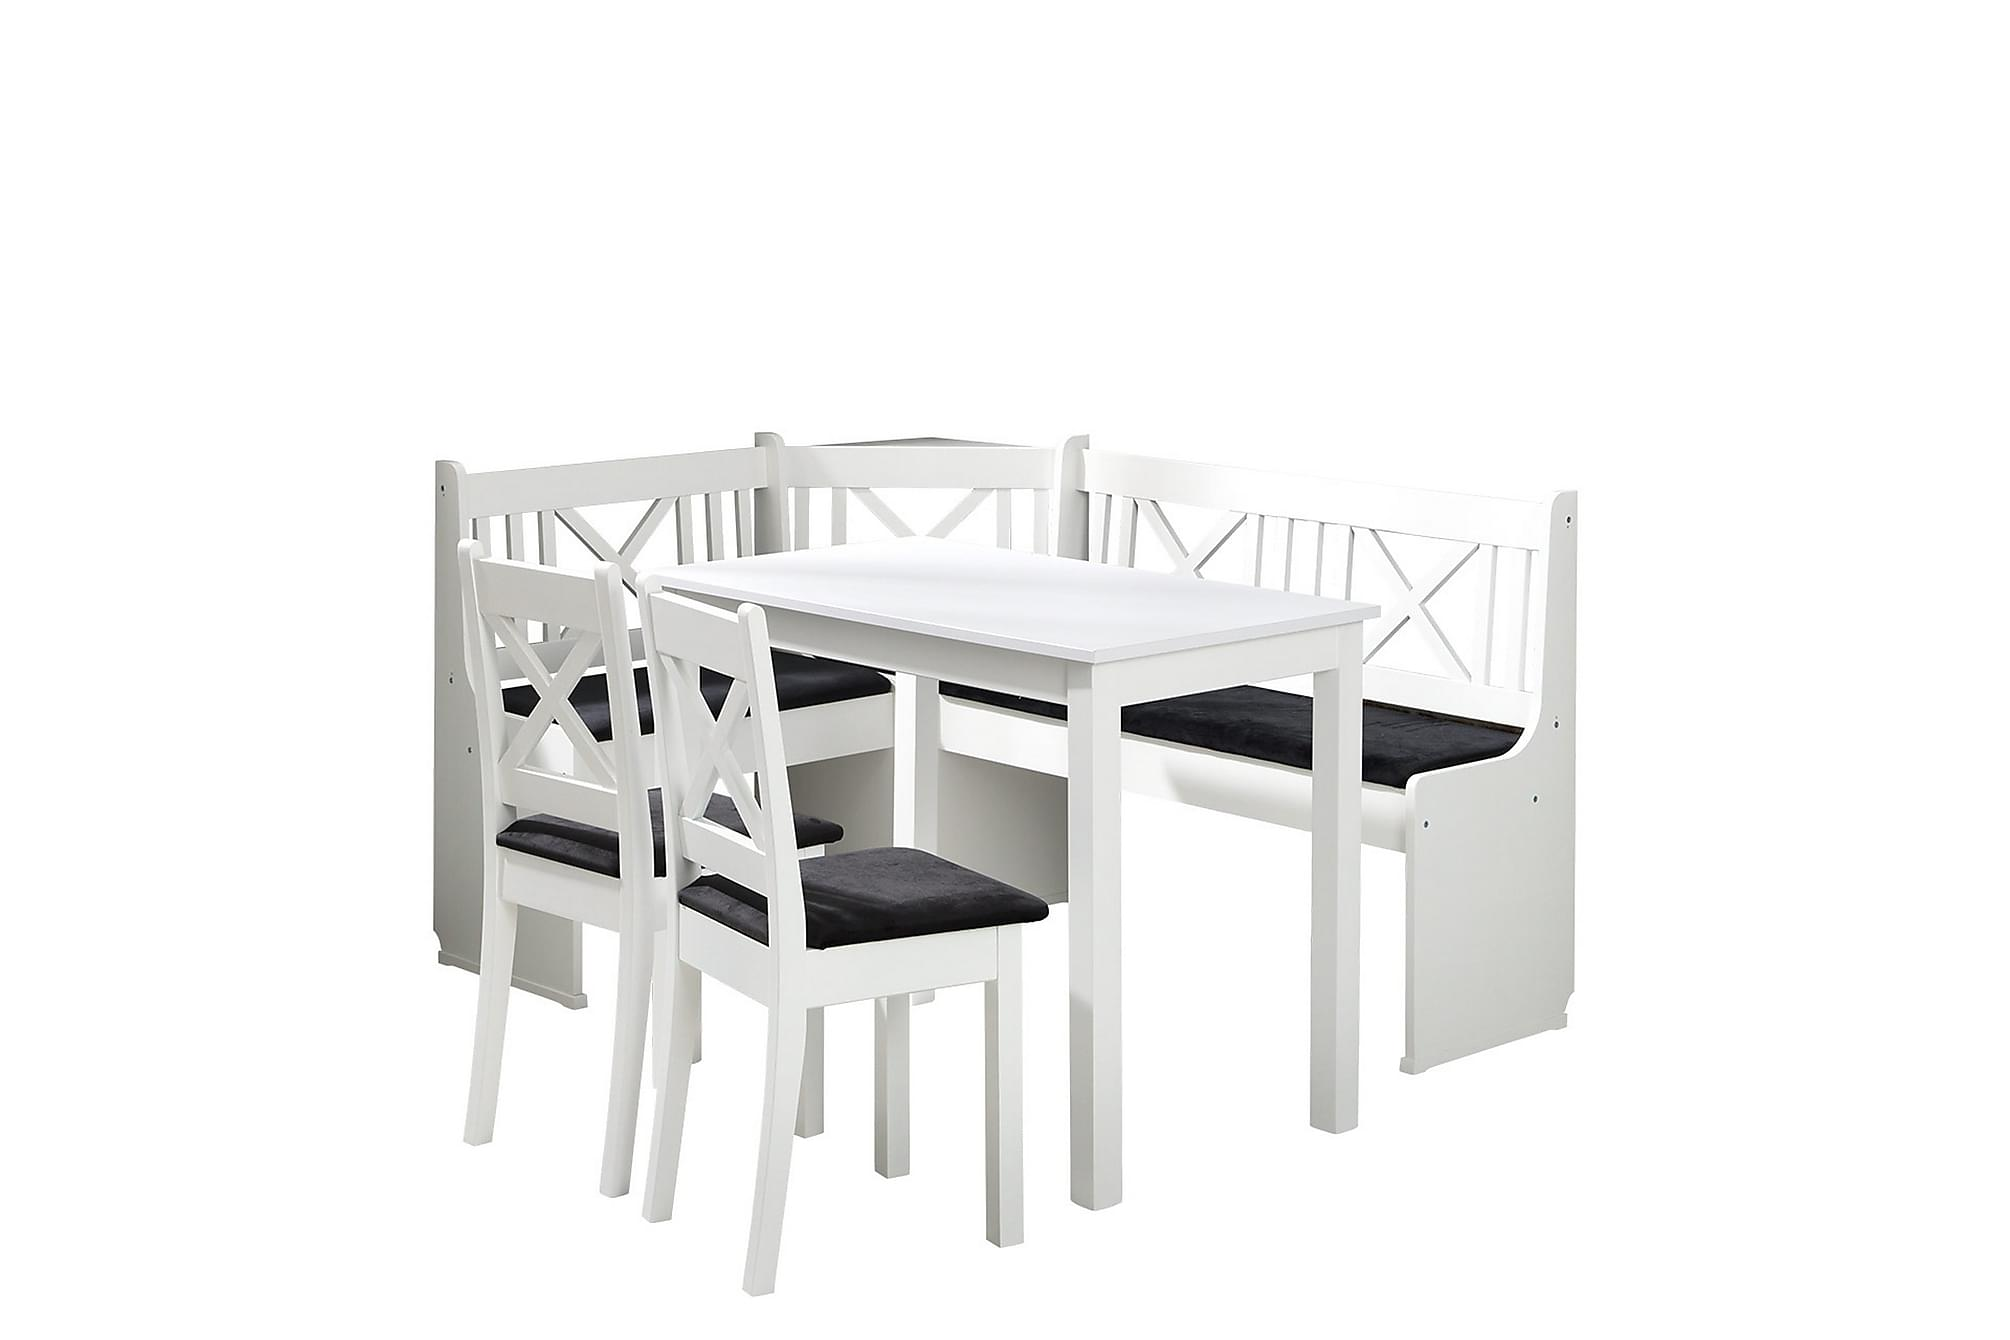 KLEBE Matgrupp Vit/Svart, Möbelset för kök & matplats